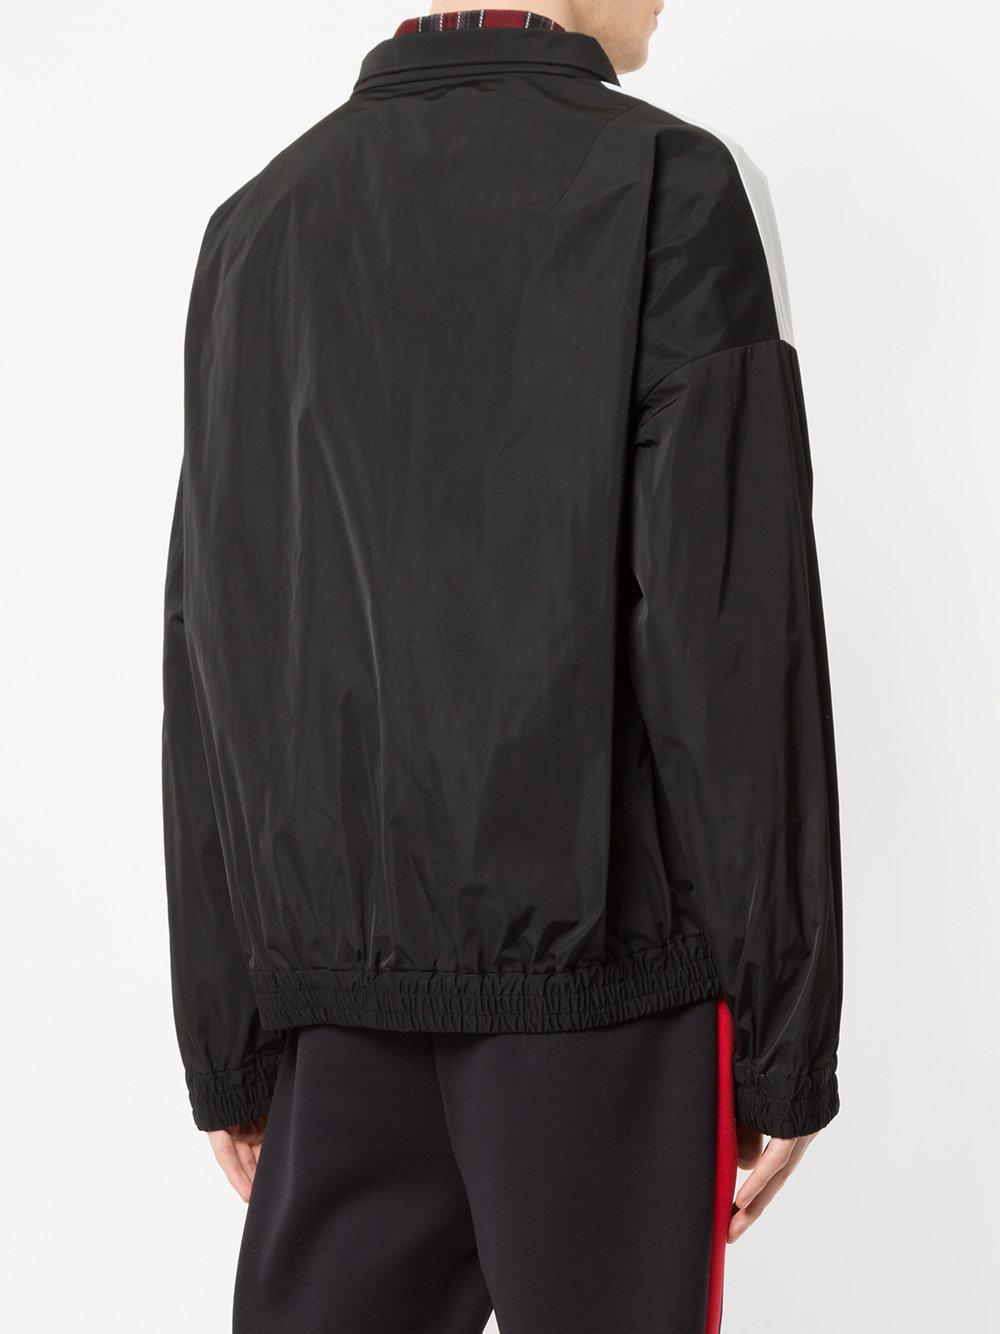 Ambush Colour Block Jacket In Black For Men Lyst